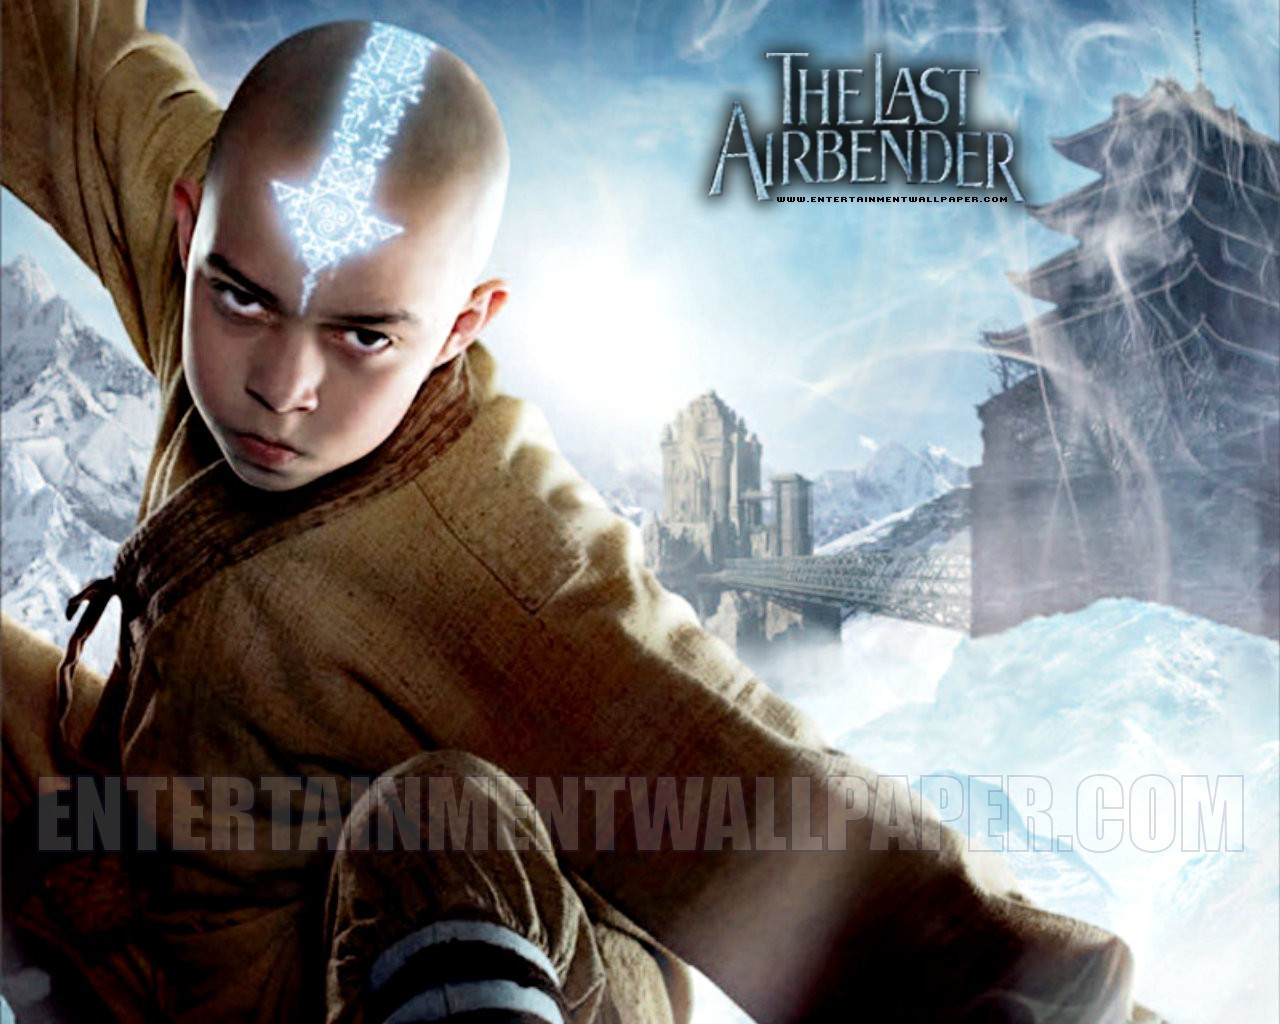 The Last Airbender 2010 Upcoming Movies Wallpaper